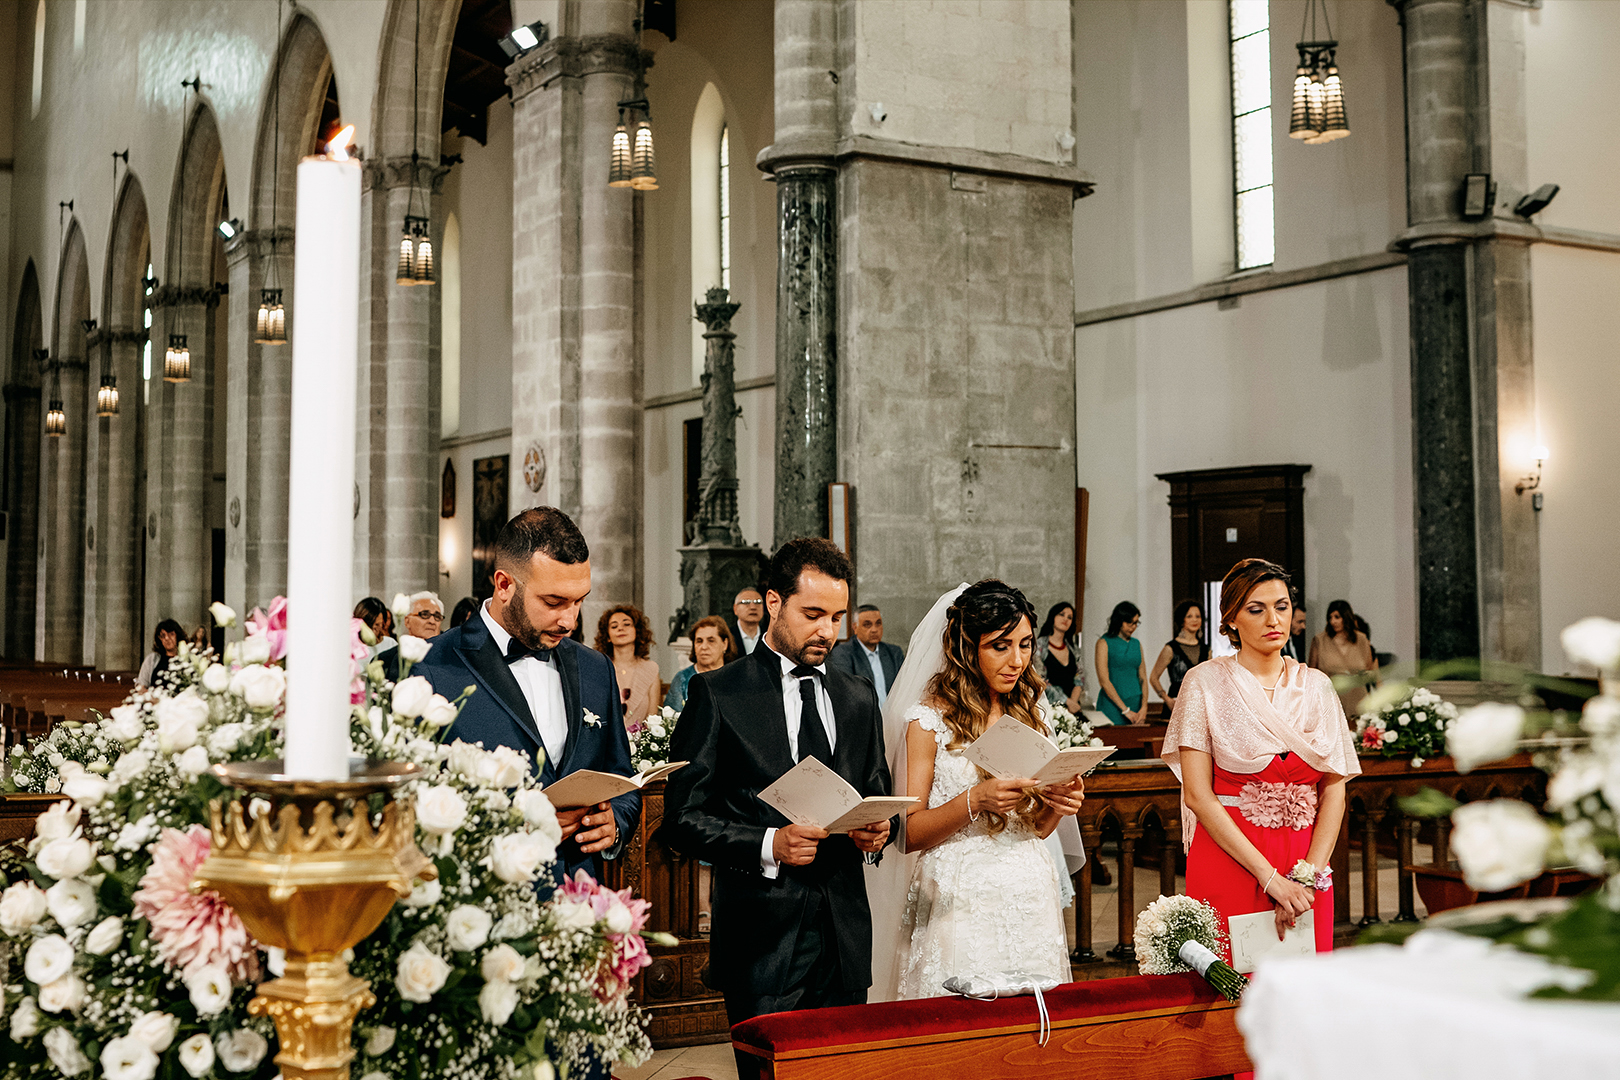 10 gianni-lepore-cattedrale-lucera-matrimonio